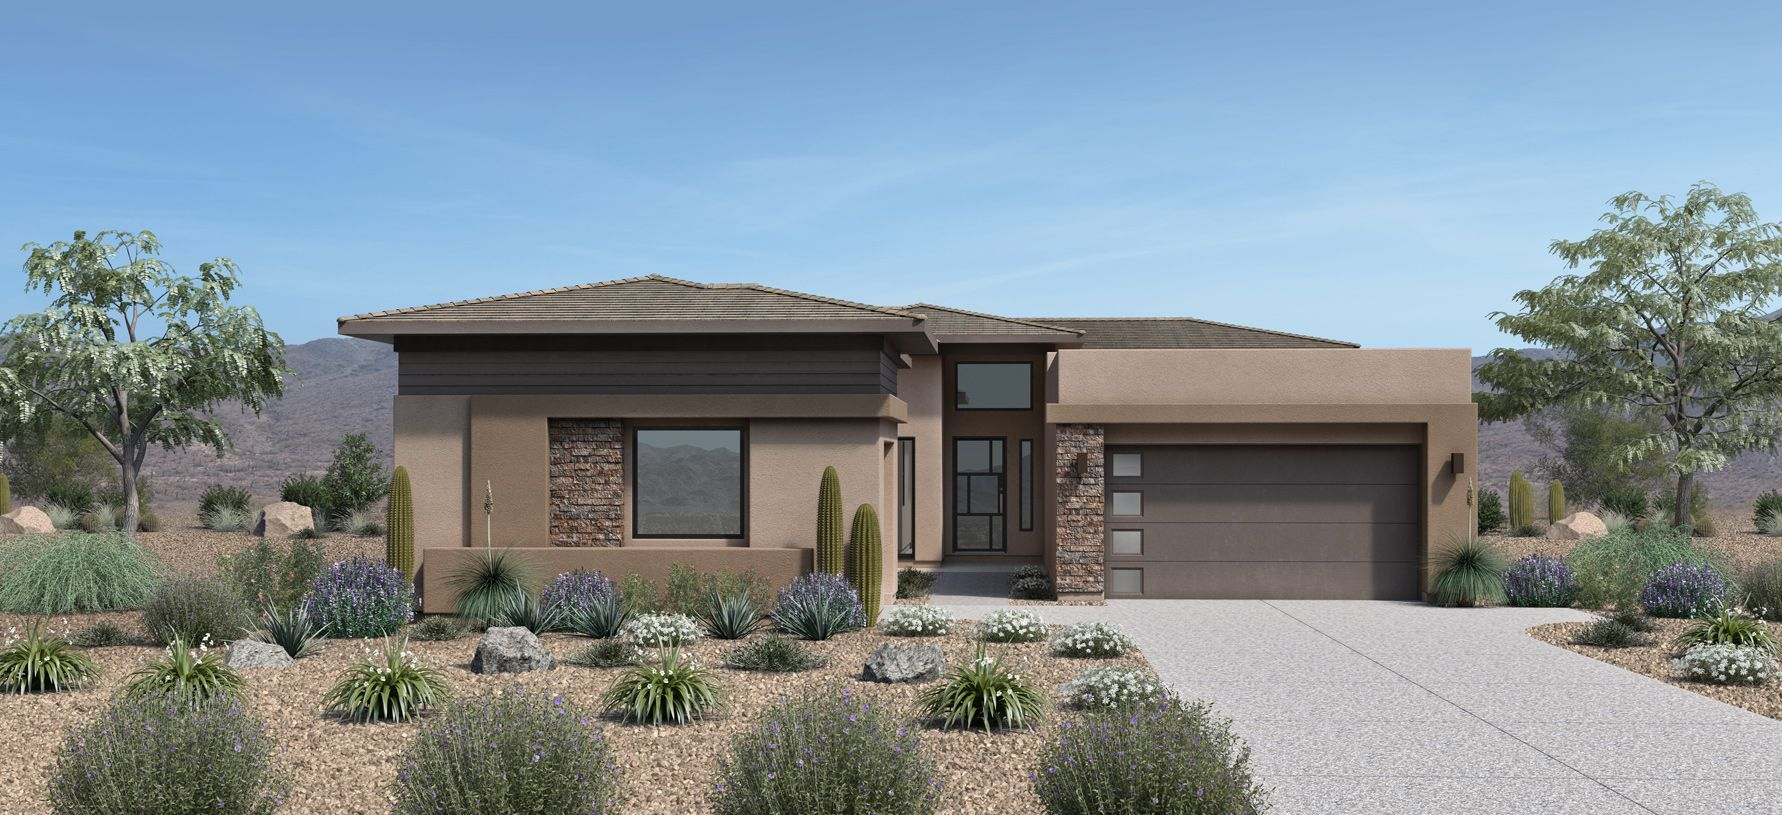 Elevation Image:Desert Contemporary